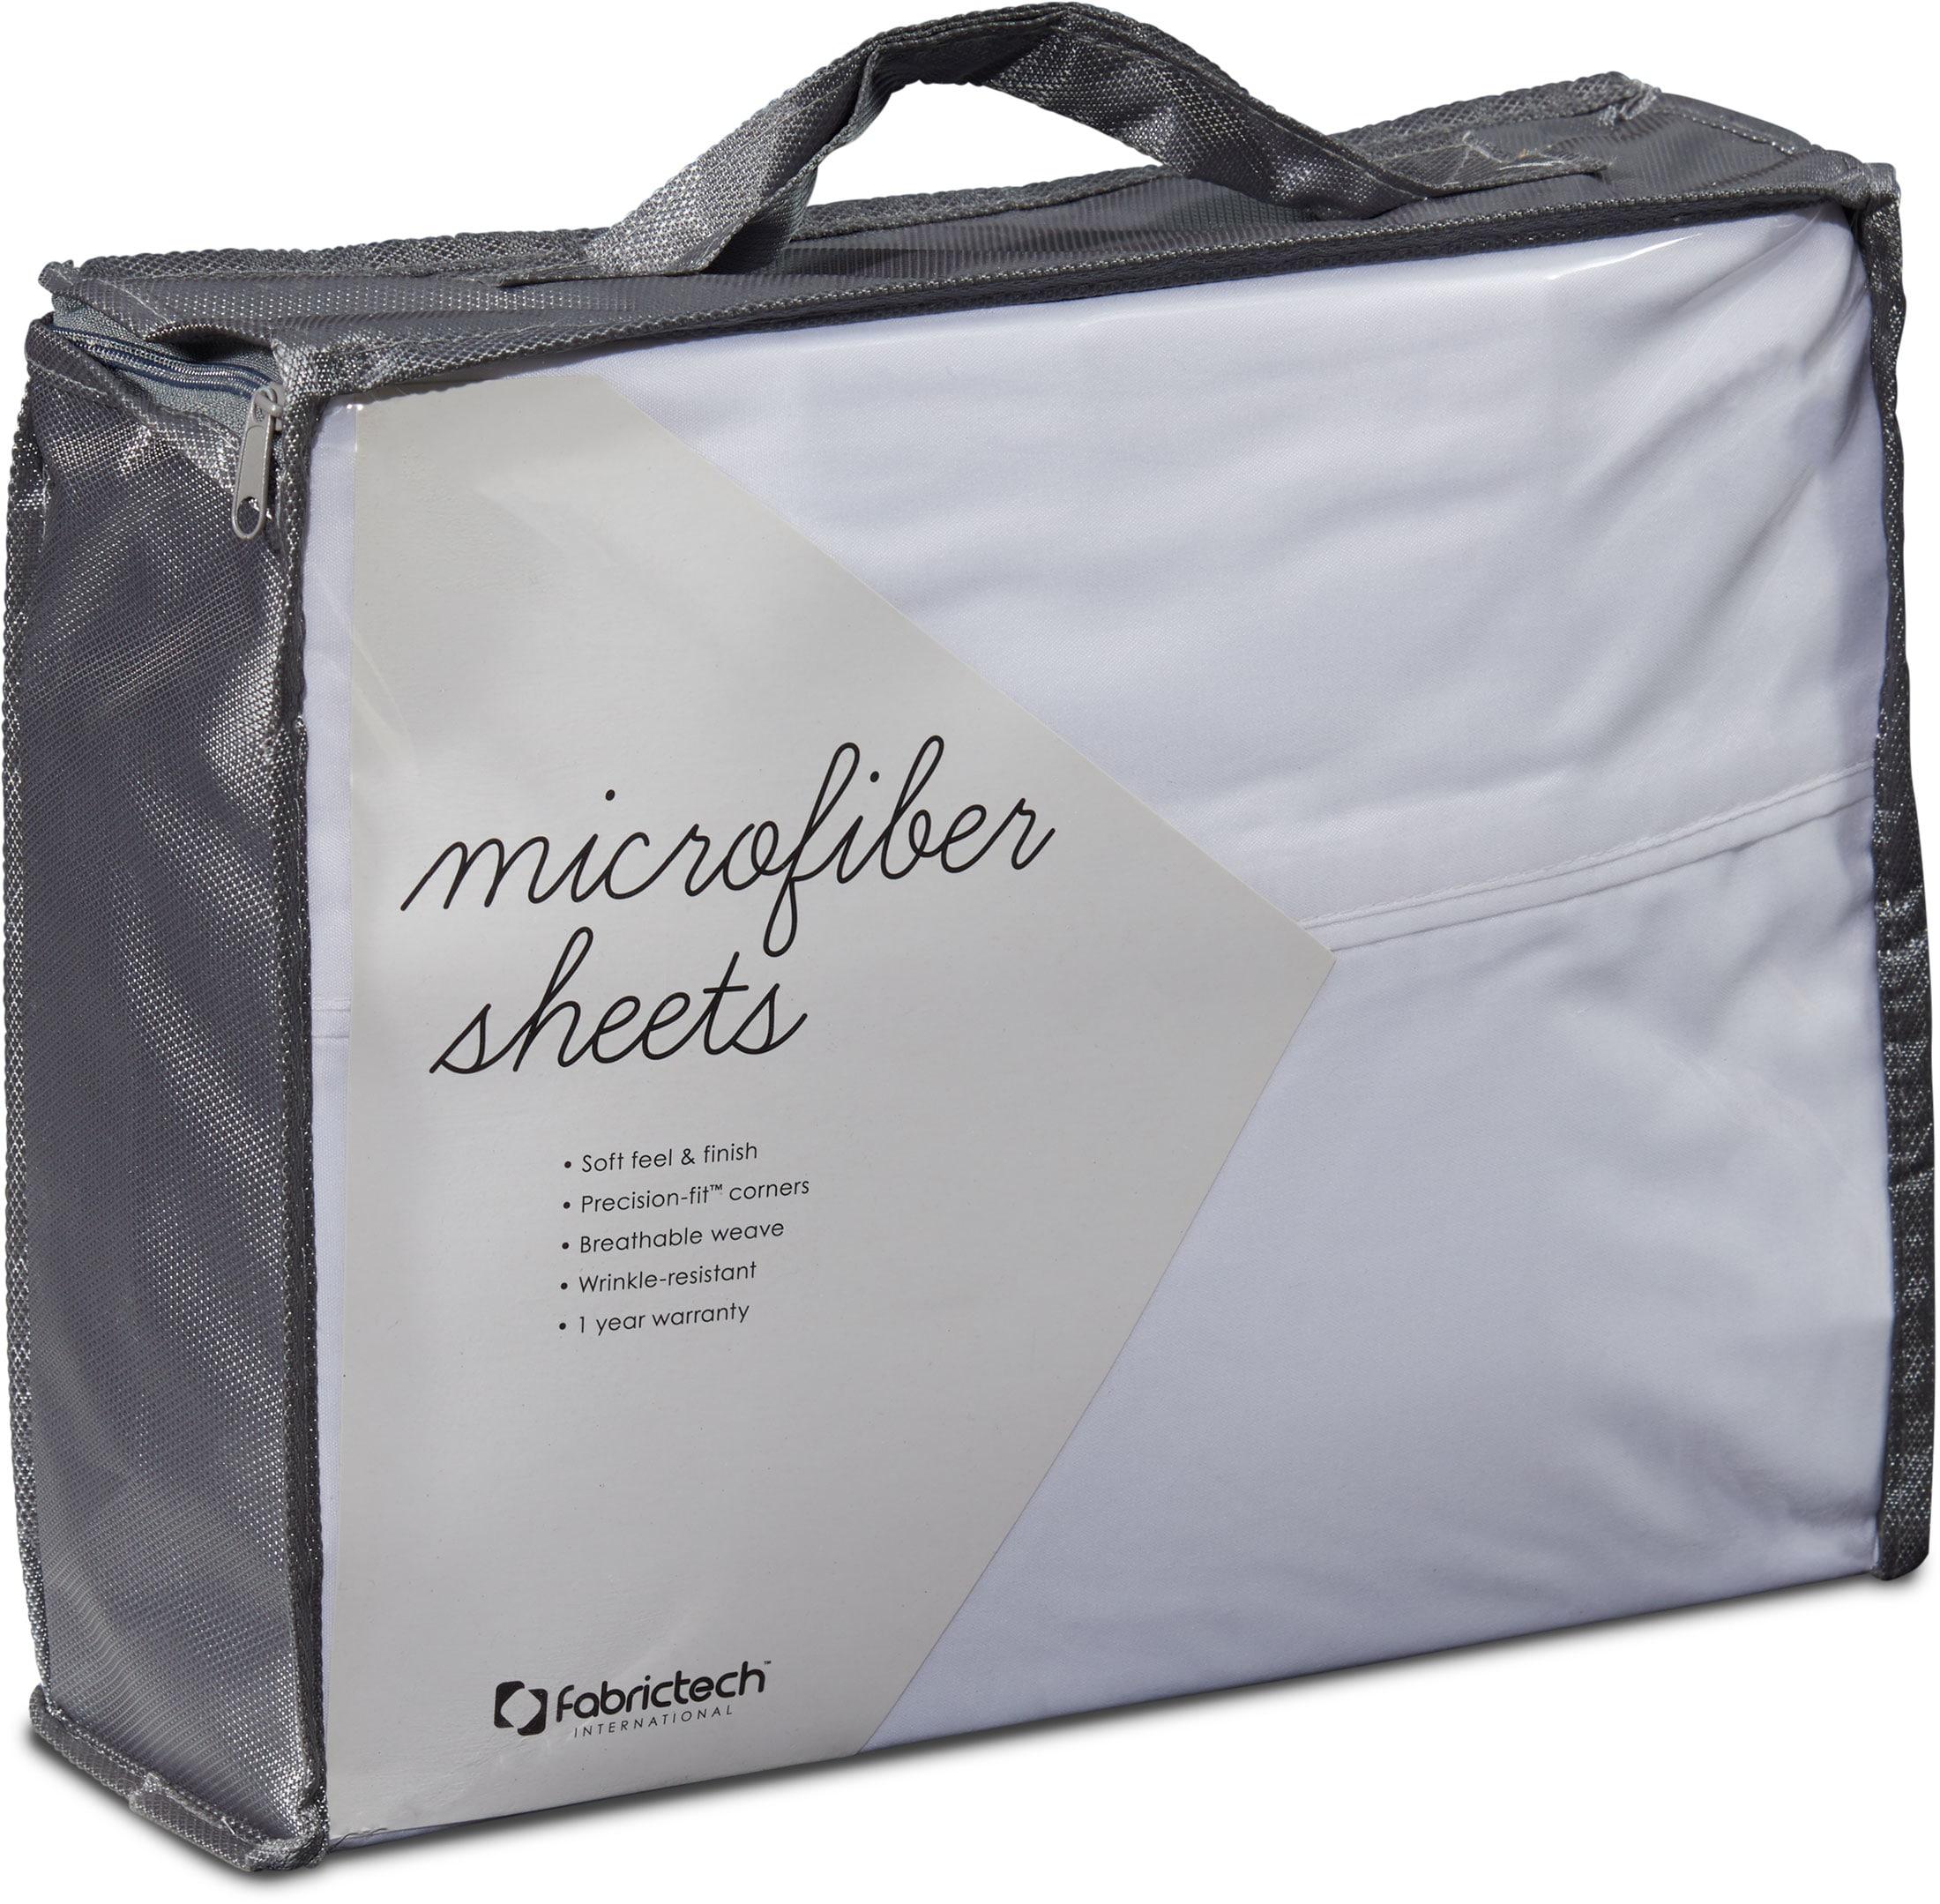 Mattresses and Bedding - Microfiber Sheet Set